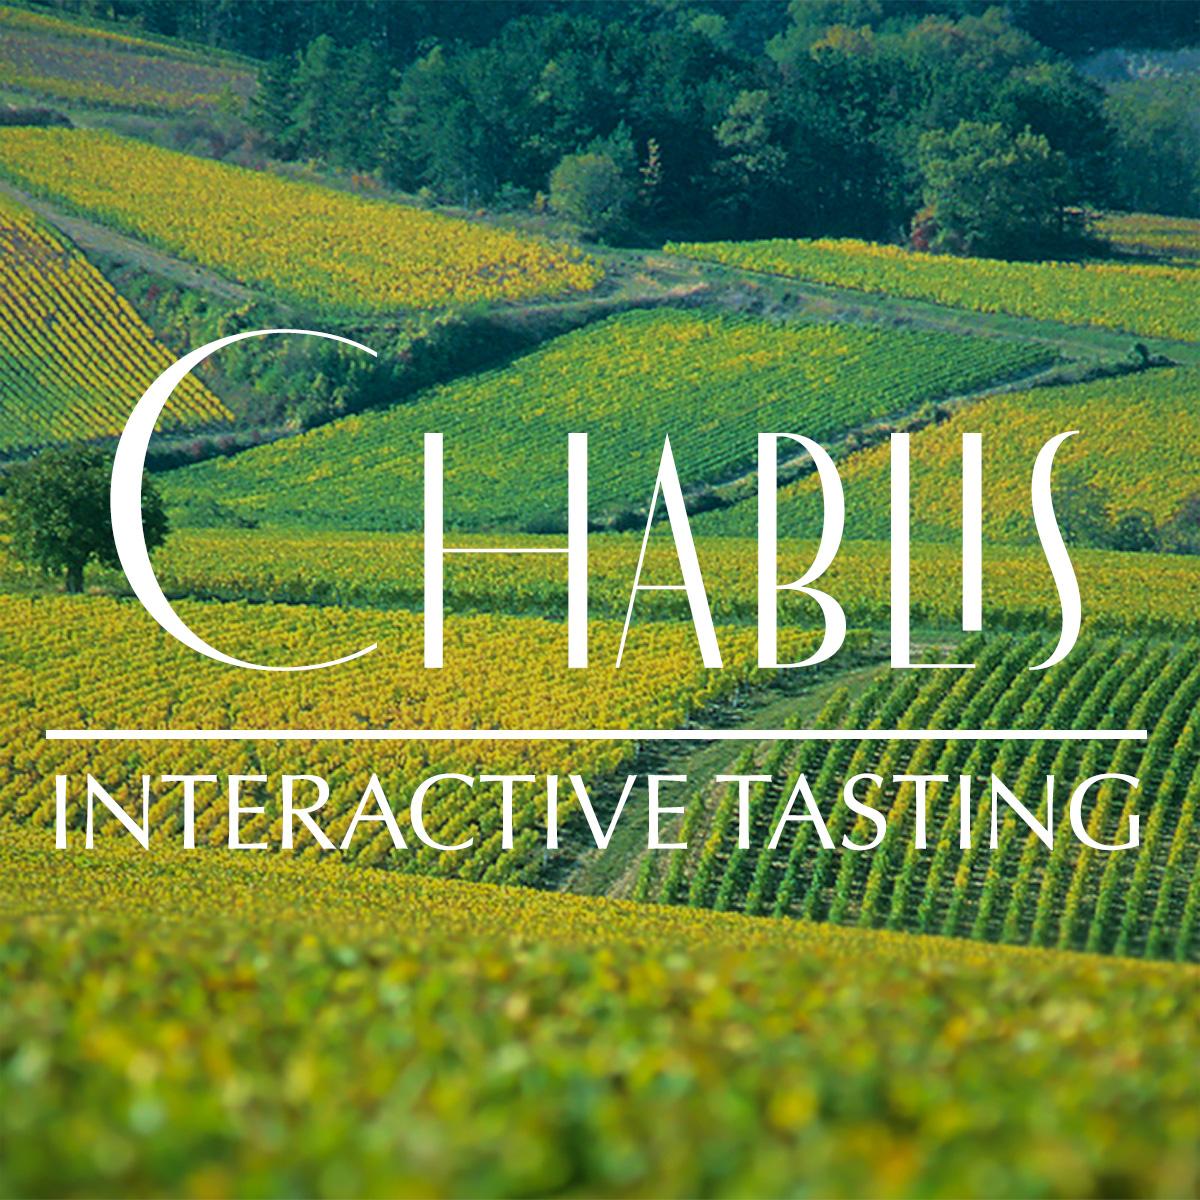 Chablis-interactive-tasting